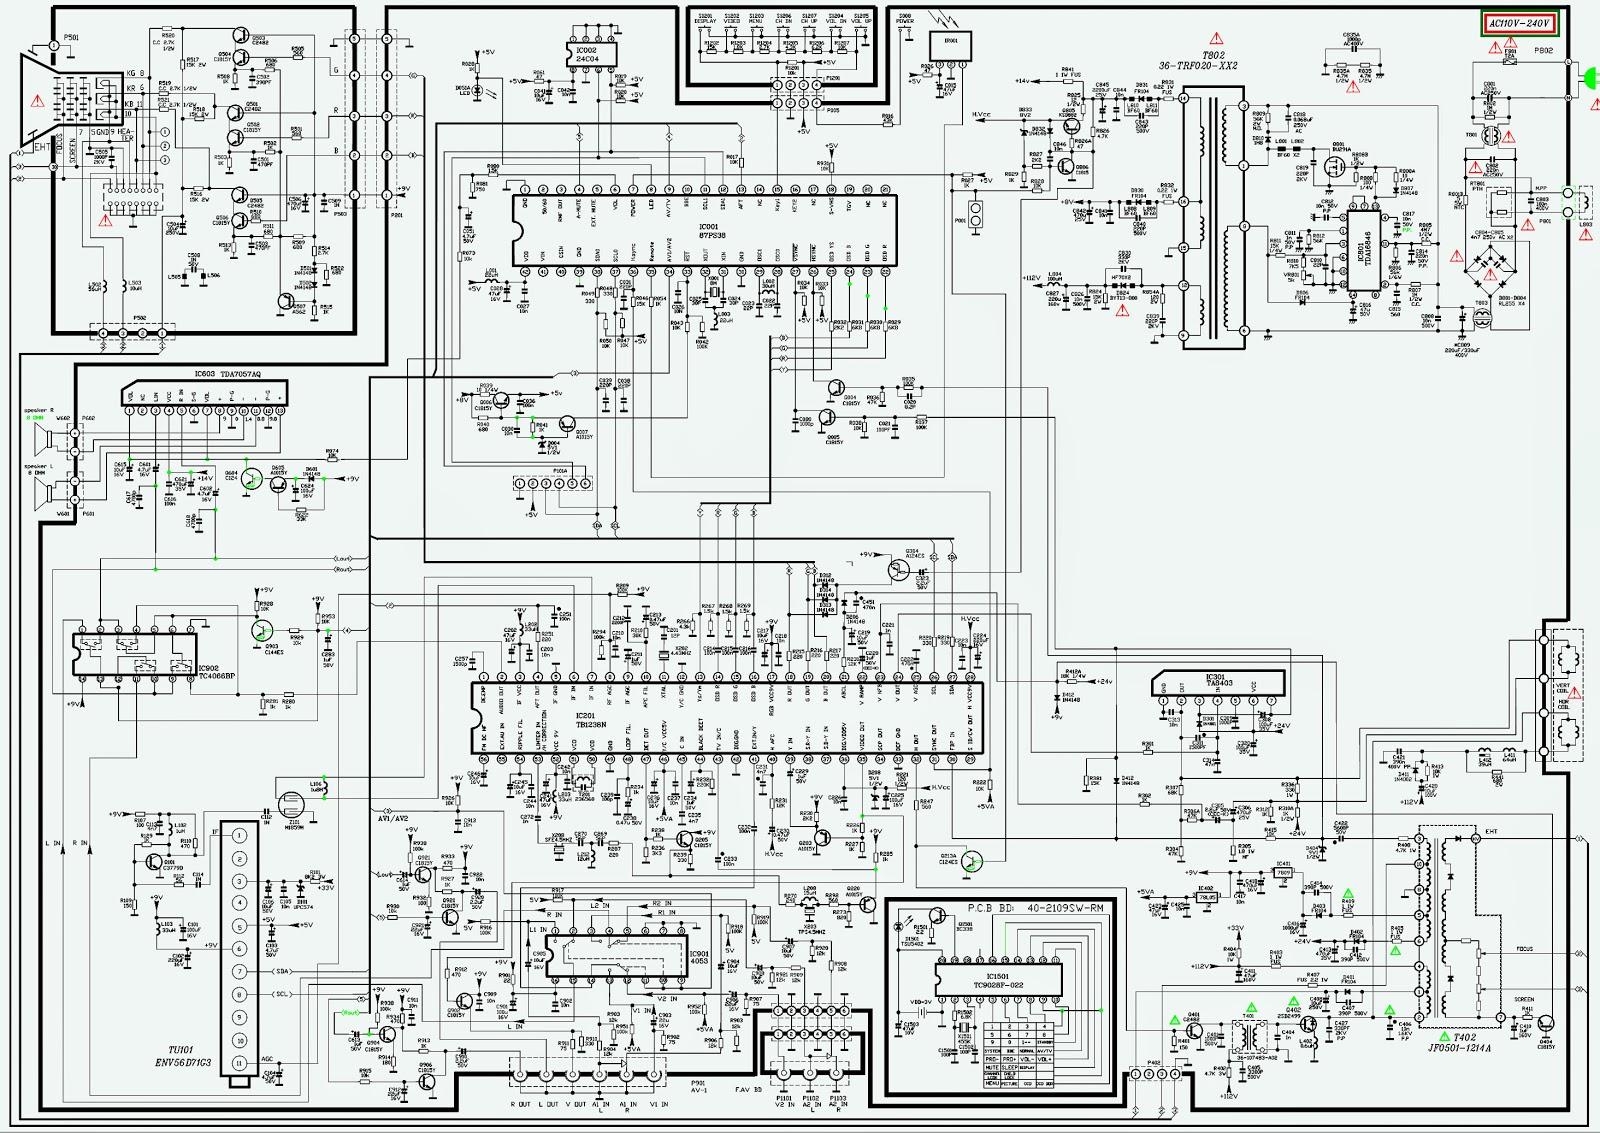 hitachi nail gun parts diagram great white shark anatomy schematic get free image about